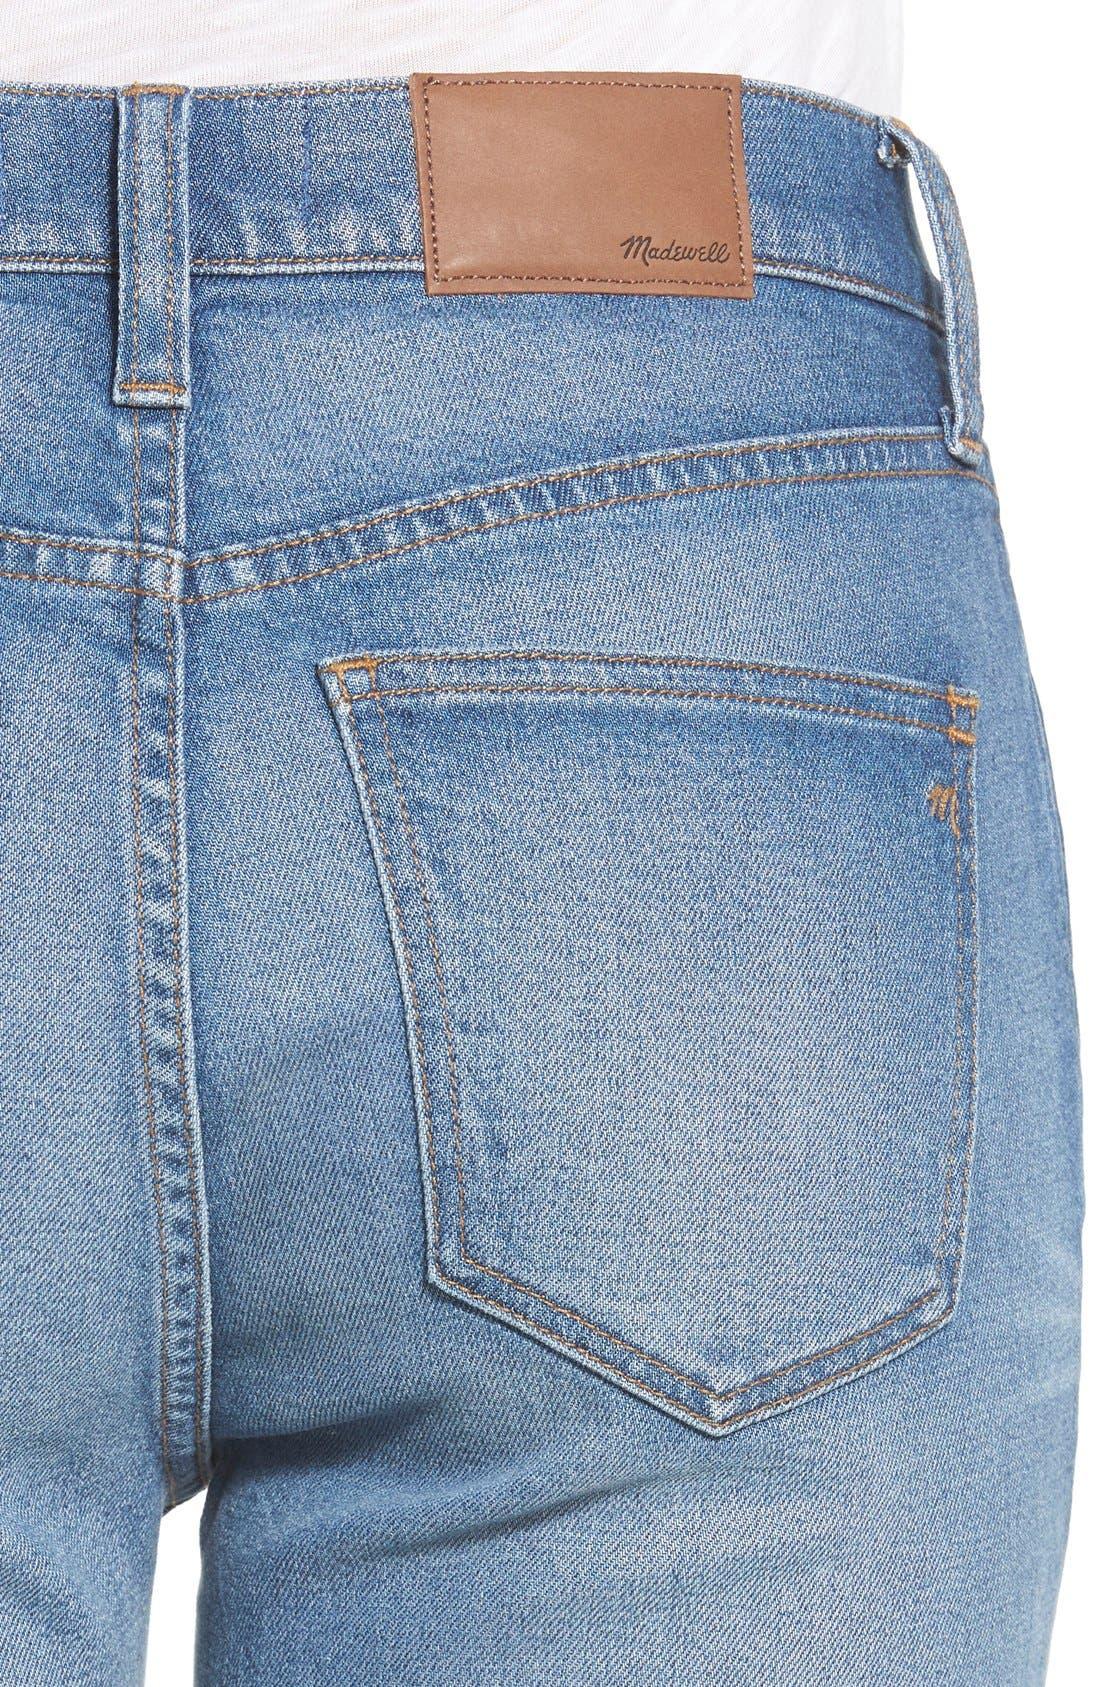 'Flea Market' Flare Jeans,                             Alternate thumbnail 4, color,                             Maribel